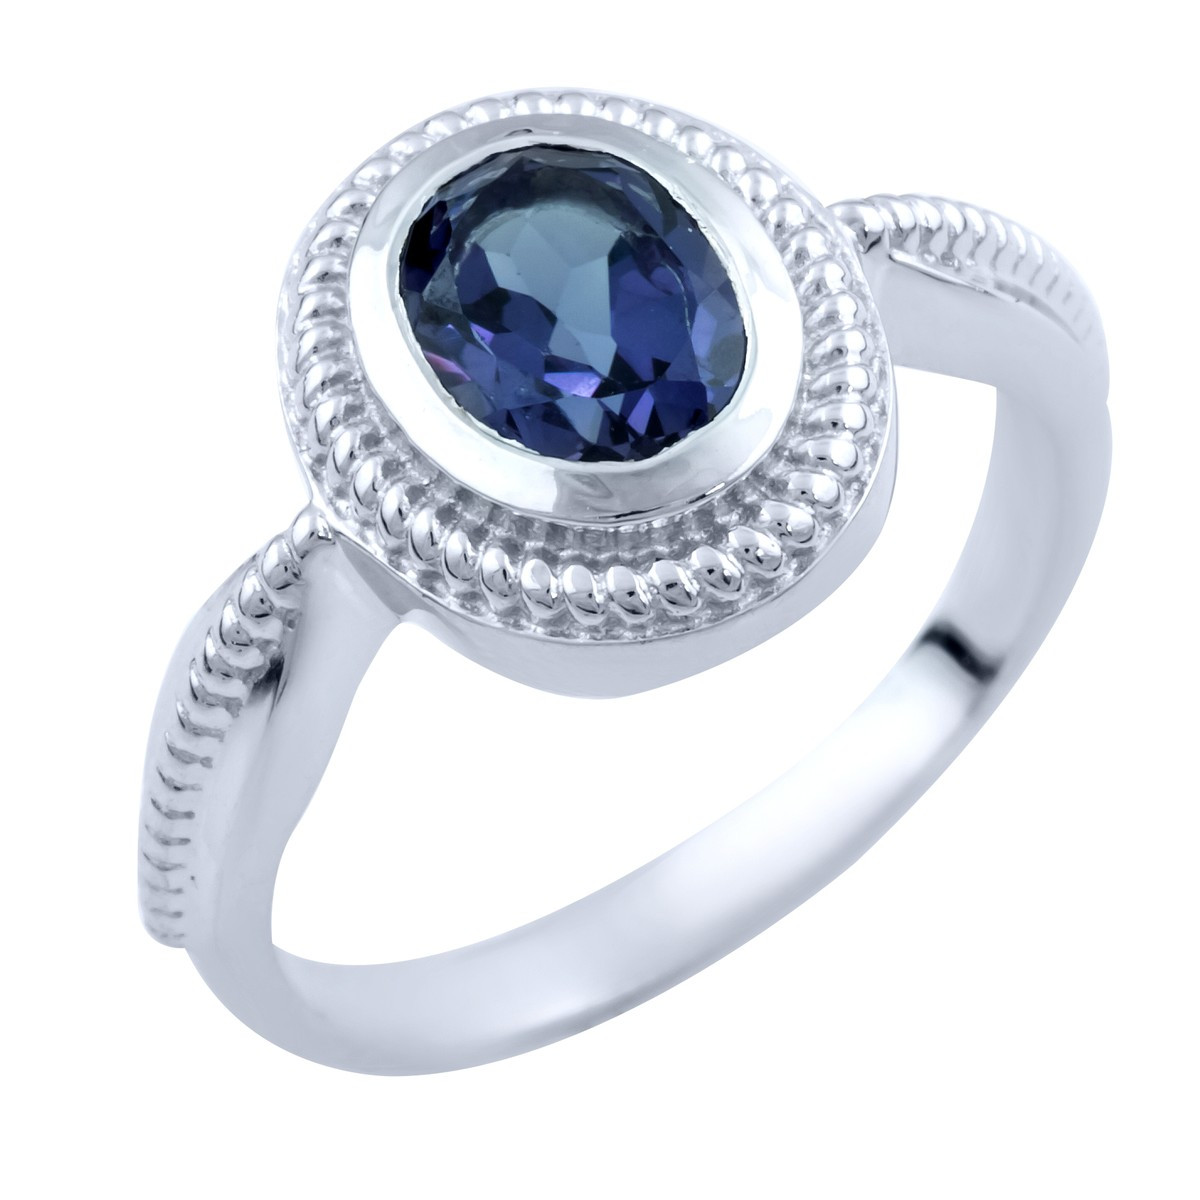 Серебряное кольцо DreamJewelry с олександритом (1765364) 17 размер